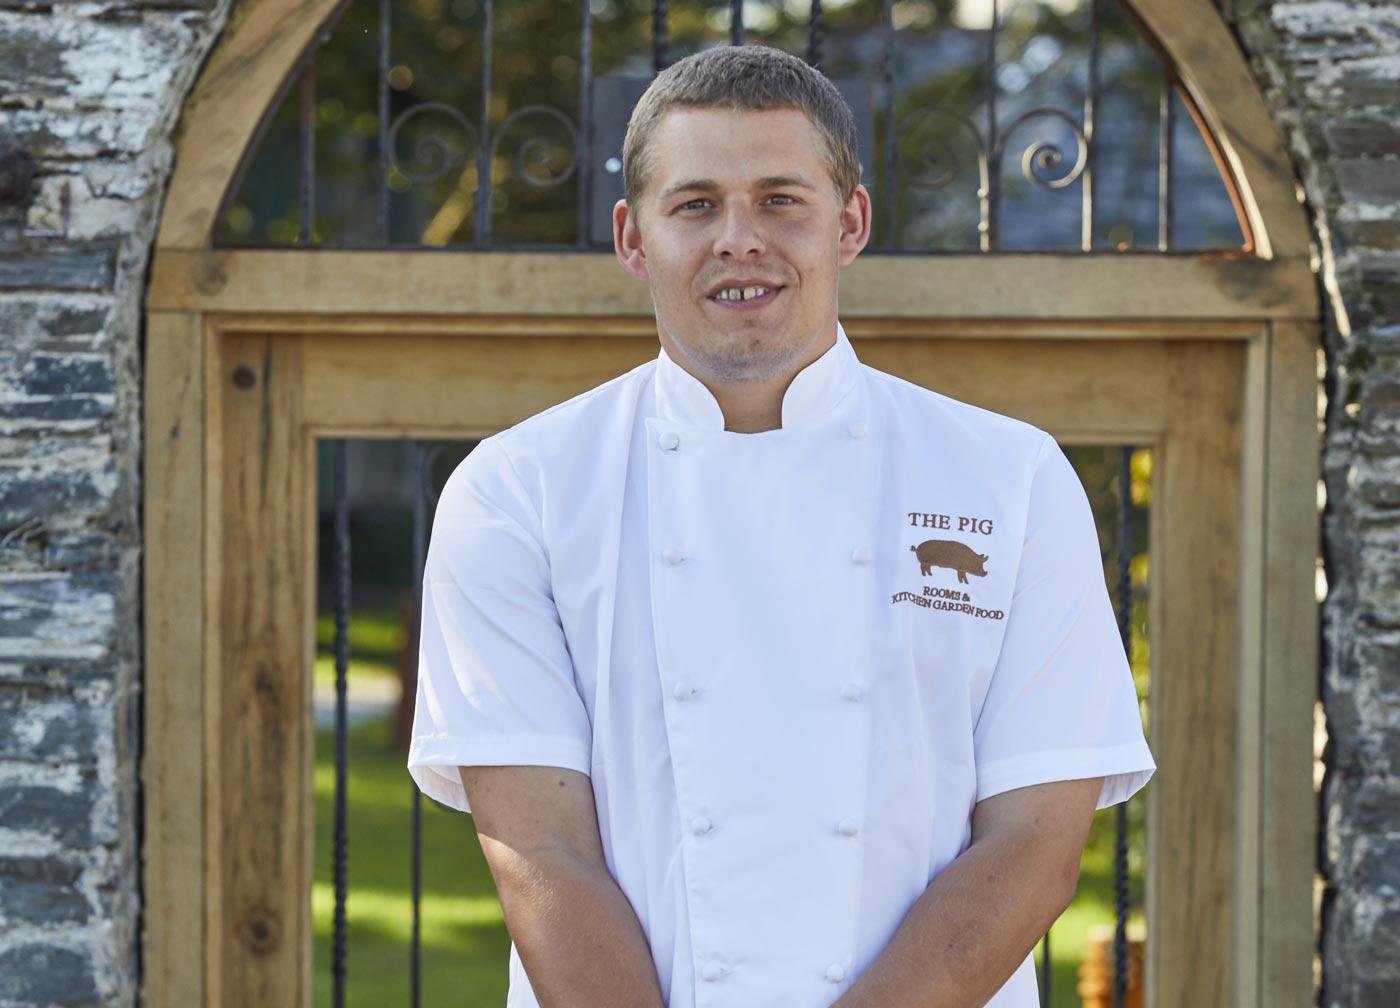 Adam Bristow, head chef of THE PIG